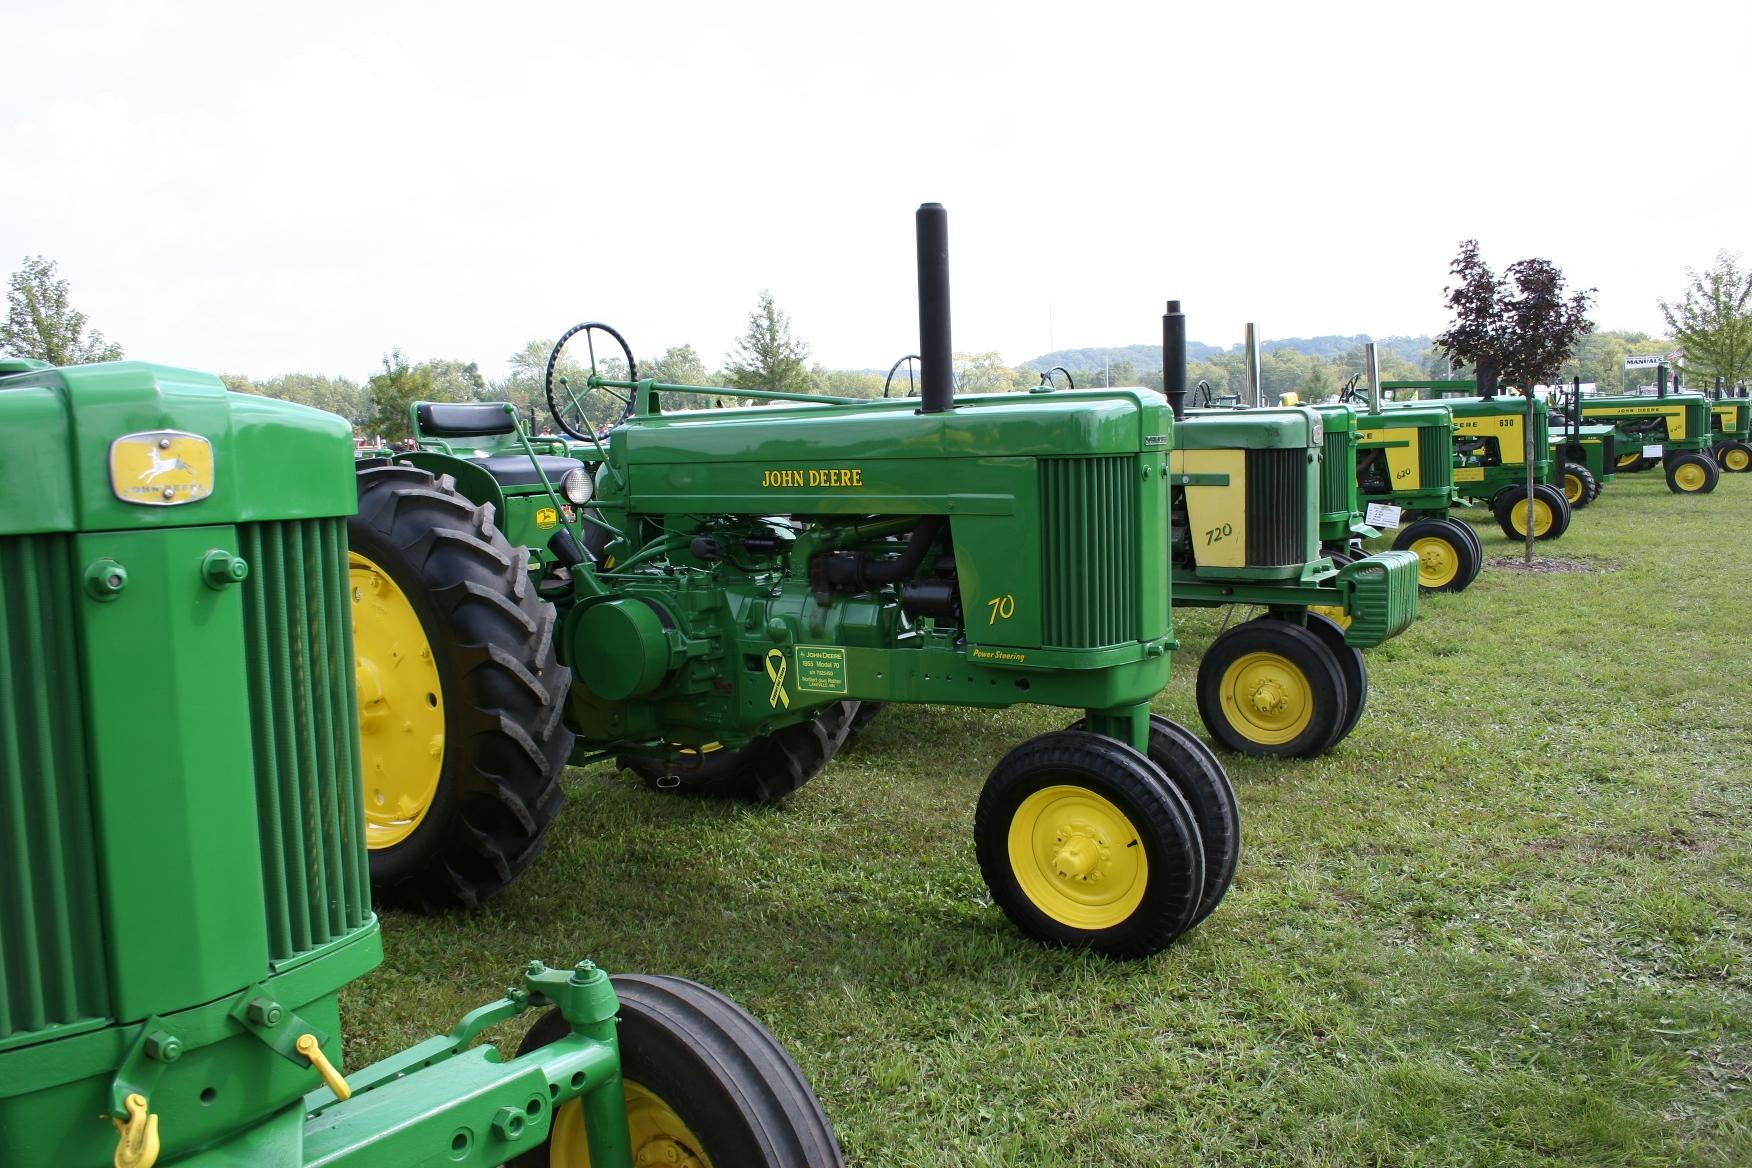 Antique John Deere Show Tractors : Credit river antique tractor club show minnesota prairie